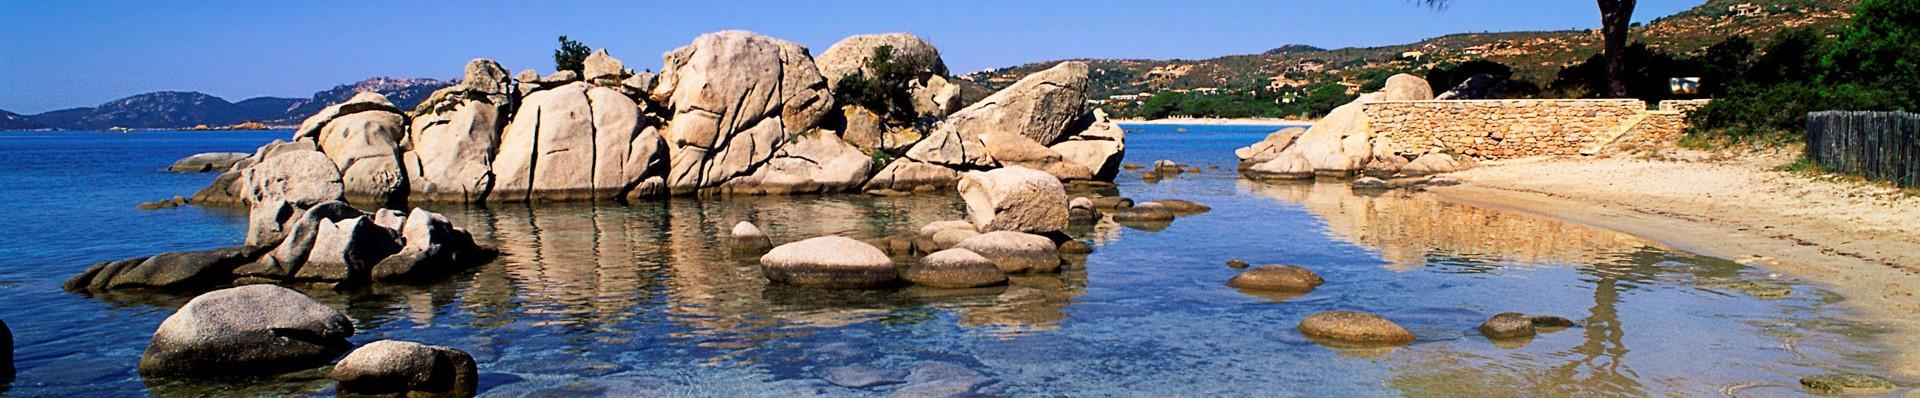 Palombaggia Beach-seminaires-de-caractere